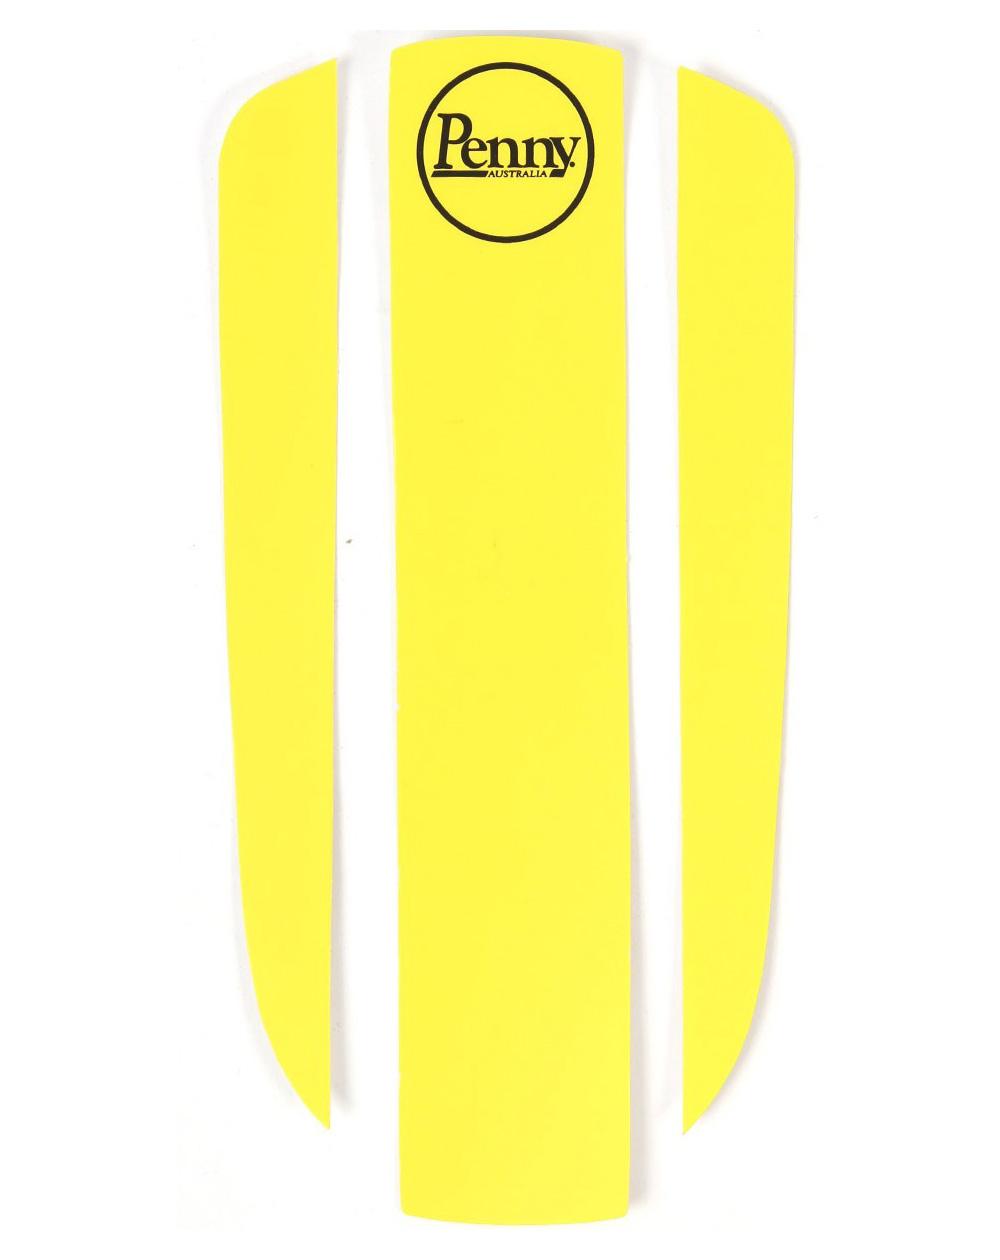 Penny Yellow 22-inch Panel-Aufkleber